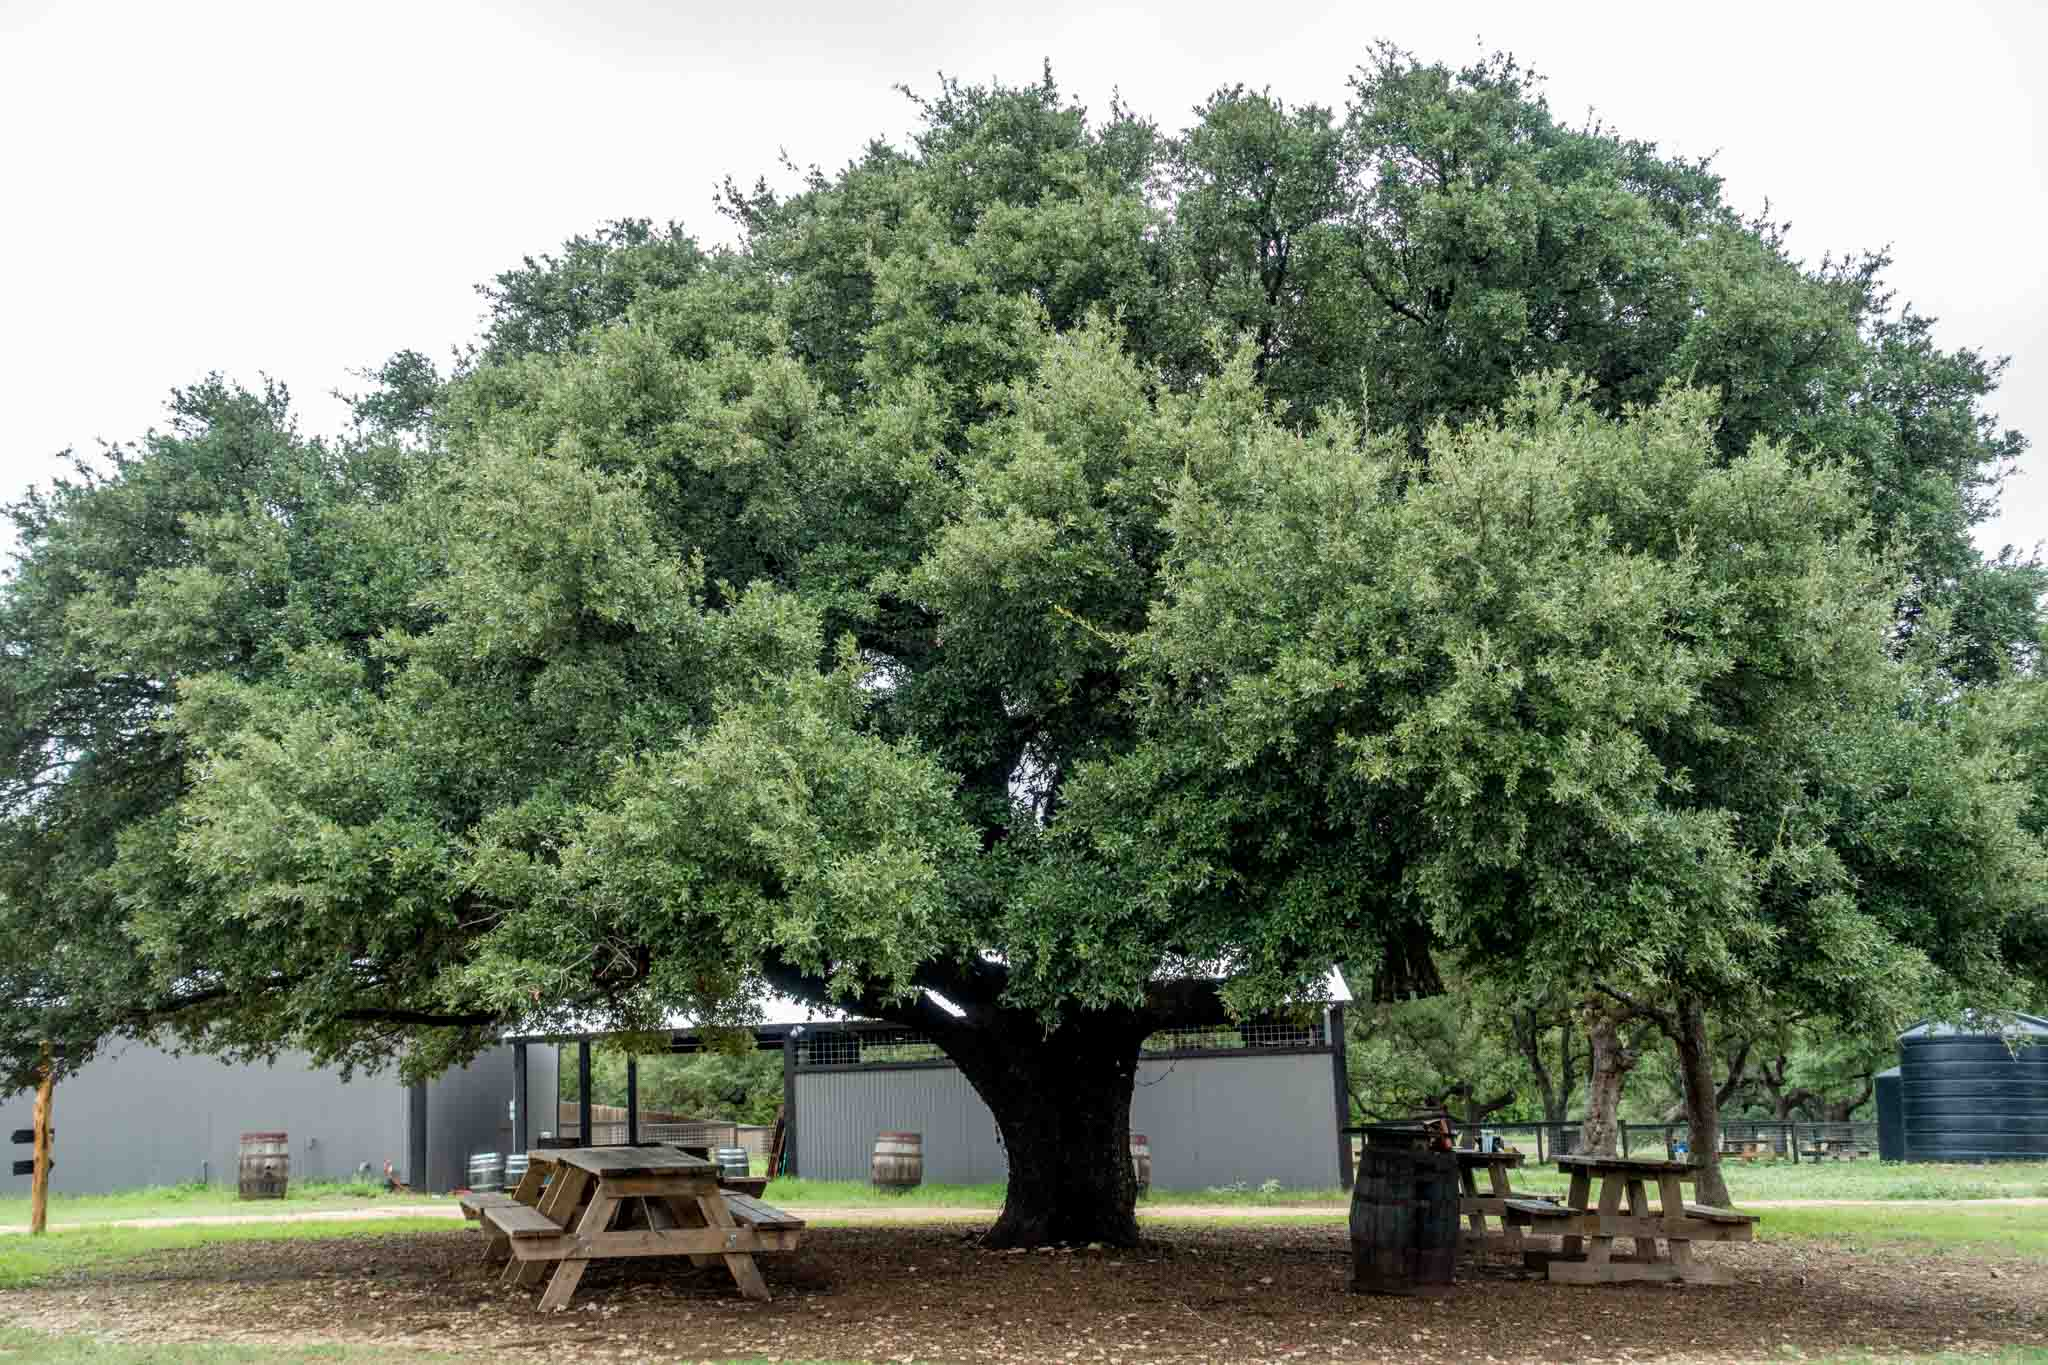 Picnic tables under a large oak tree